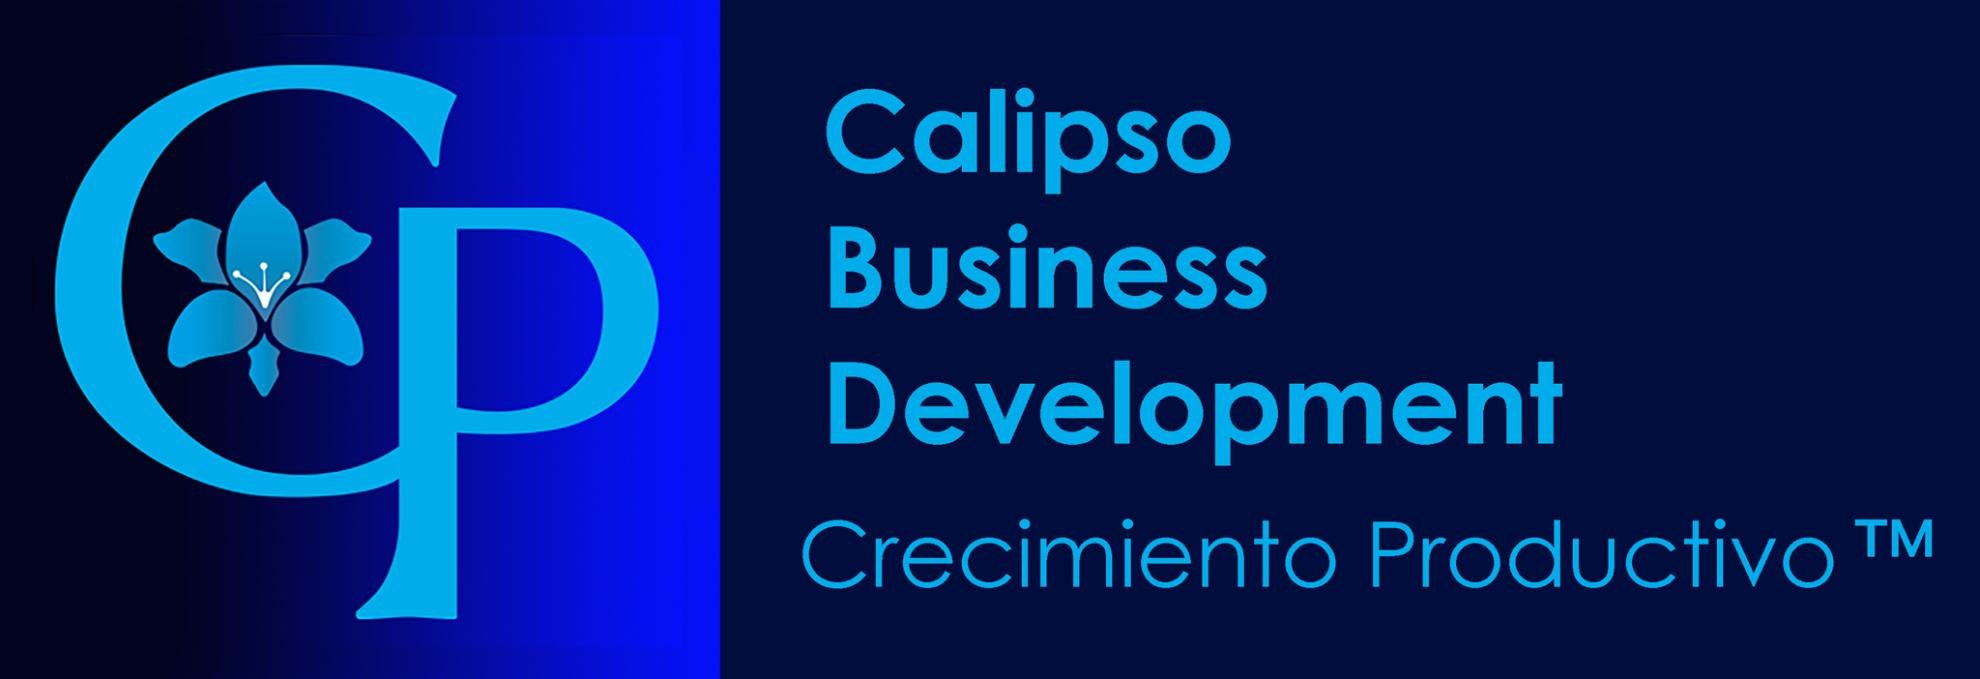 Calipso Business